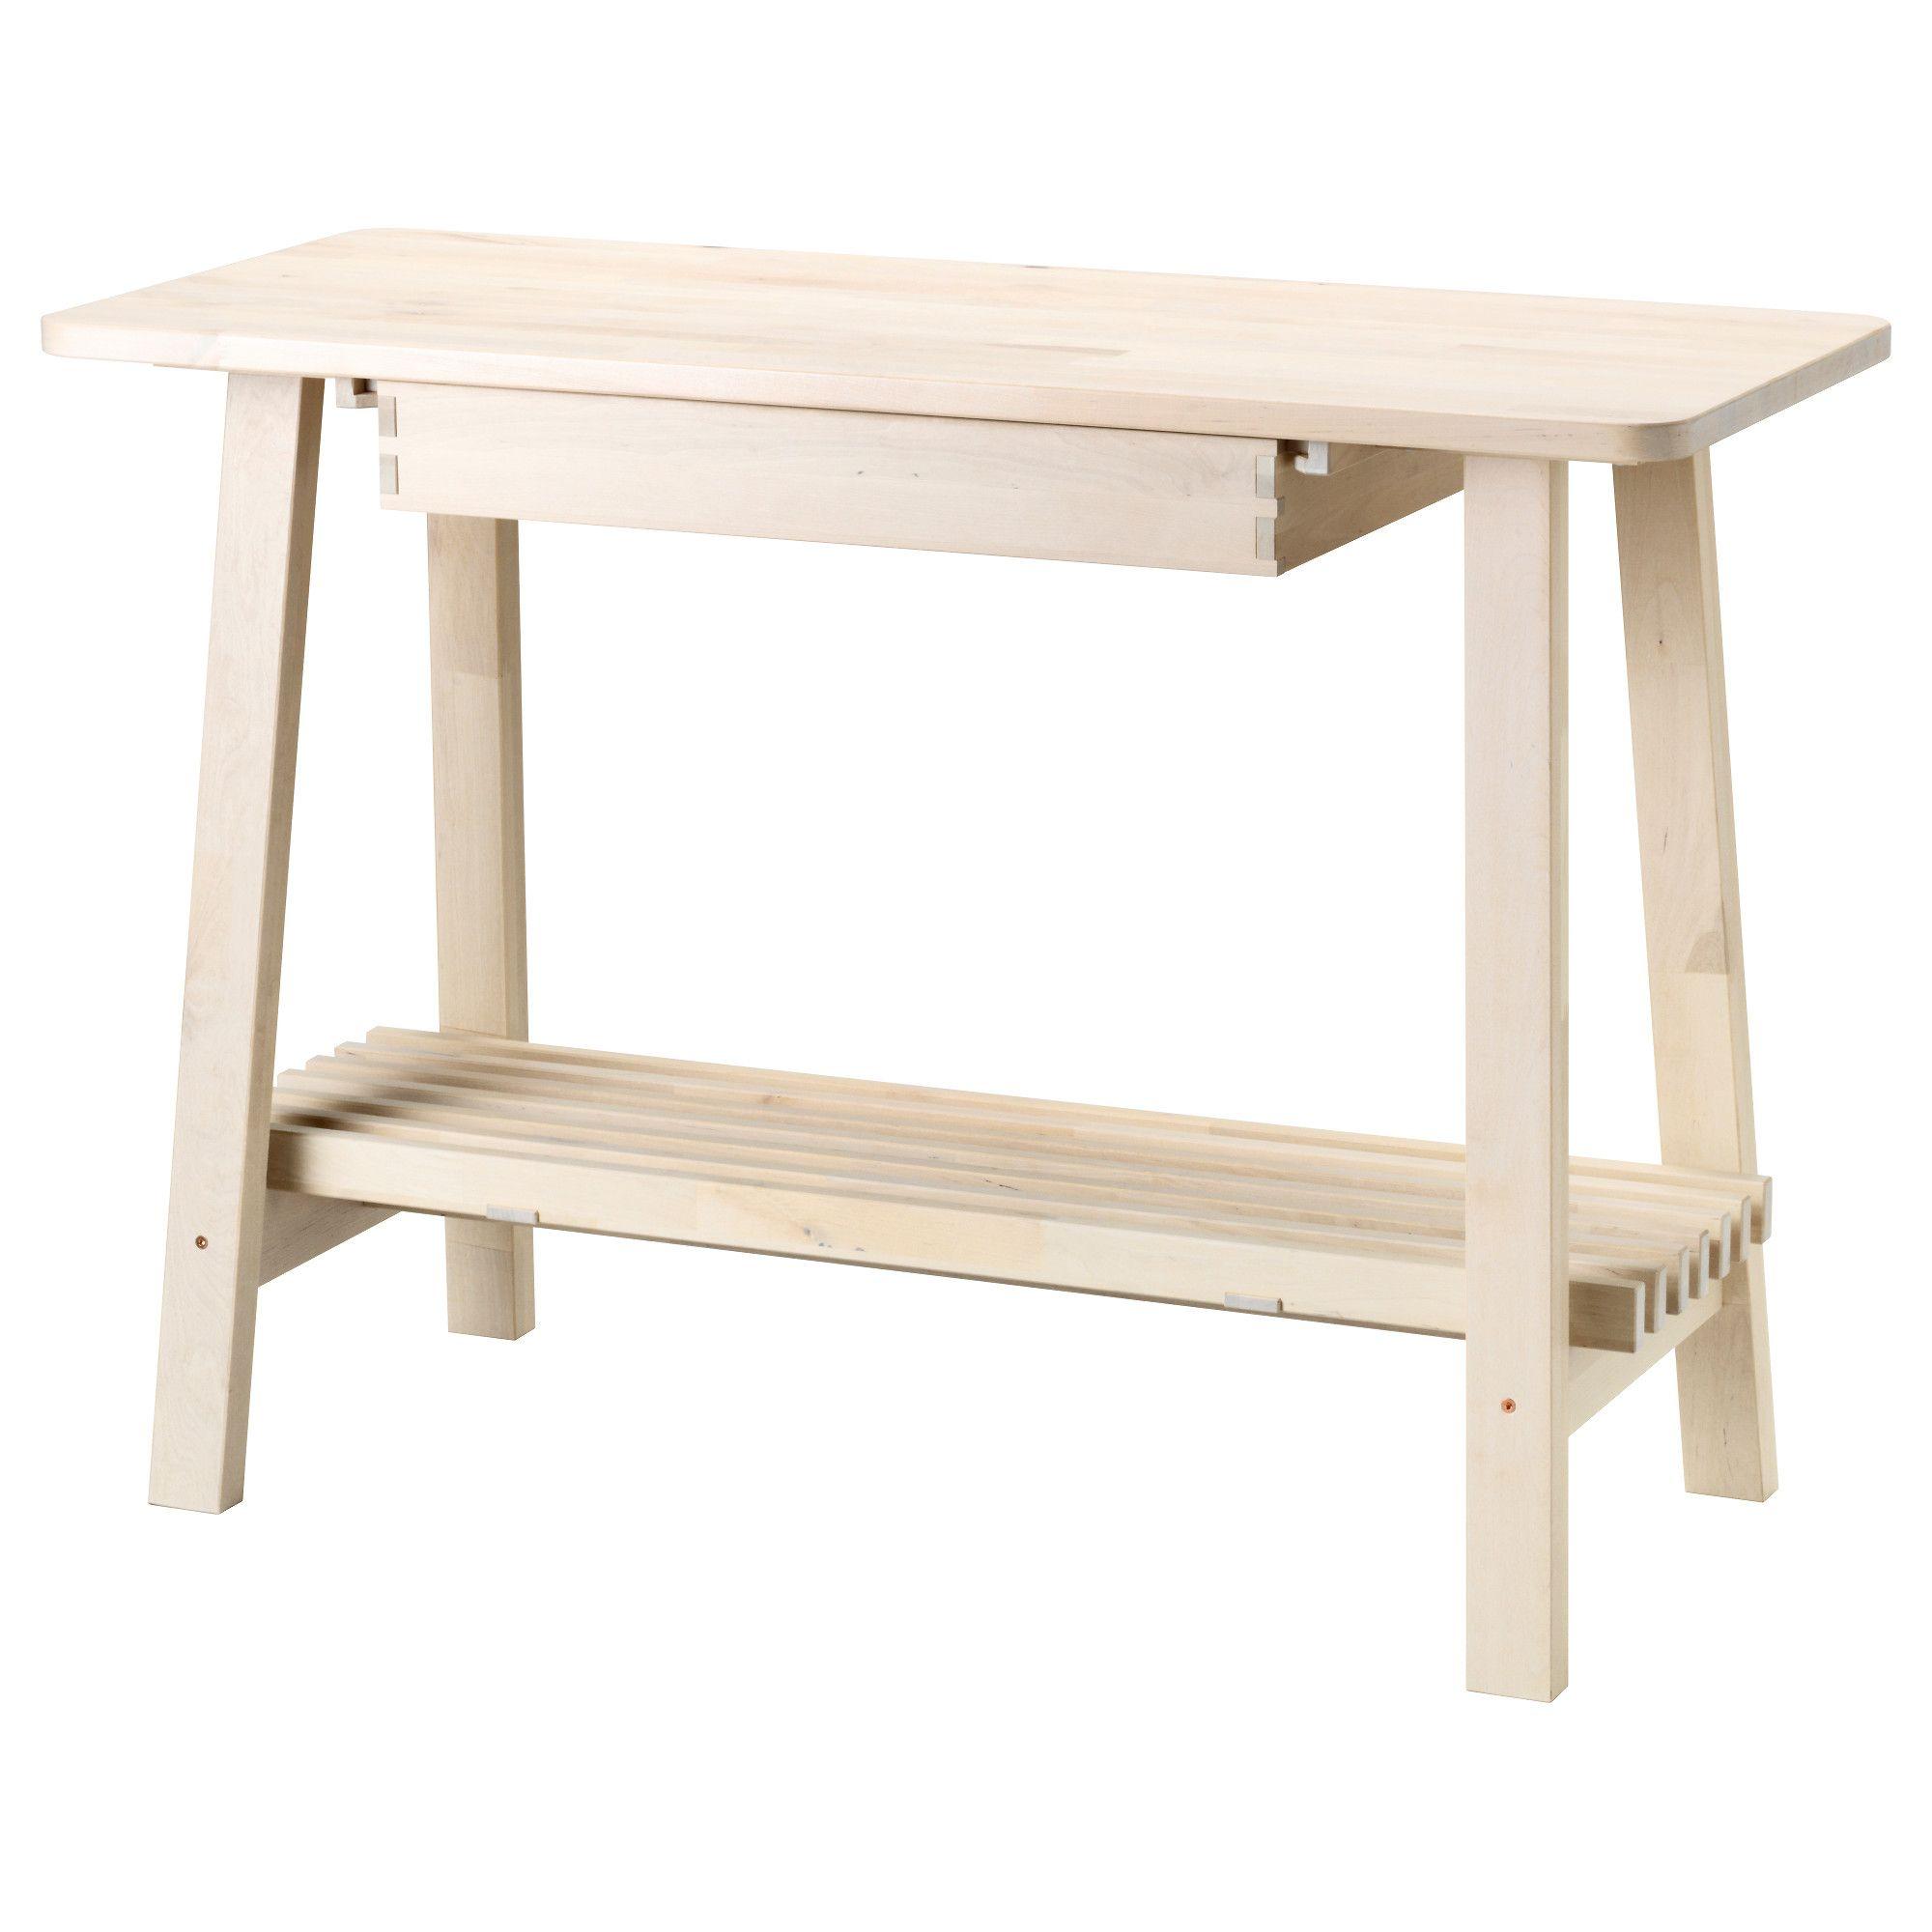 Kitchen Island Ikea Decor: NORRÅKER Sideboard, White Birch In 2019